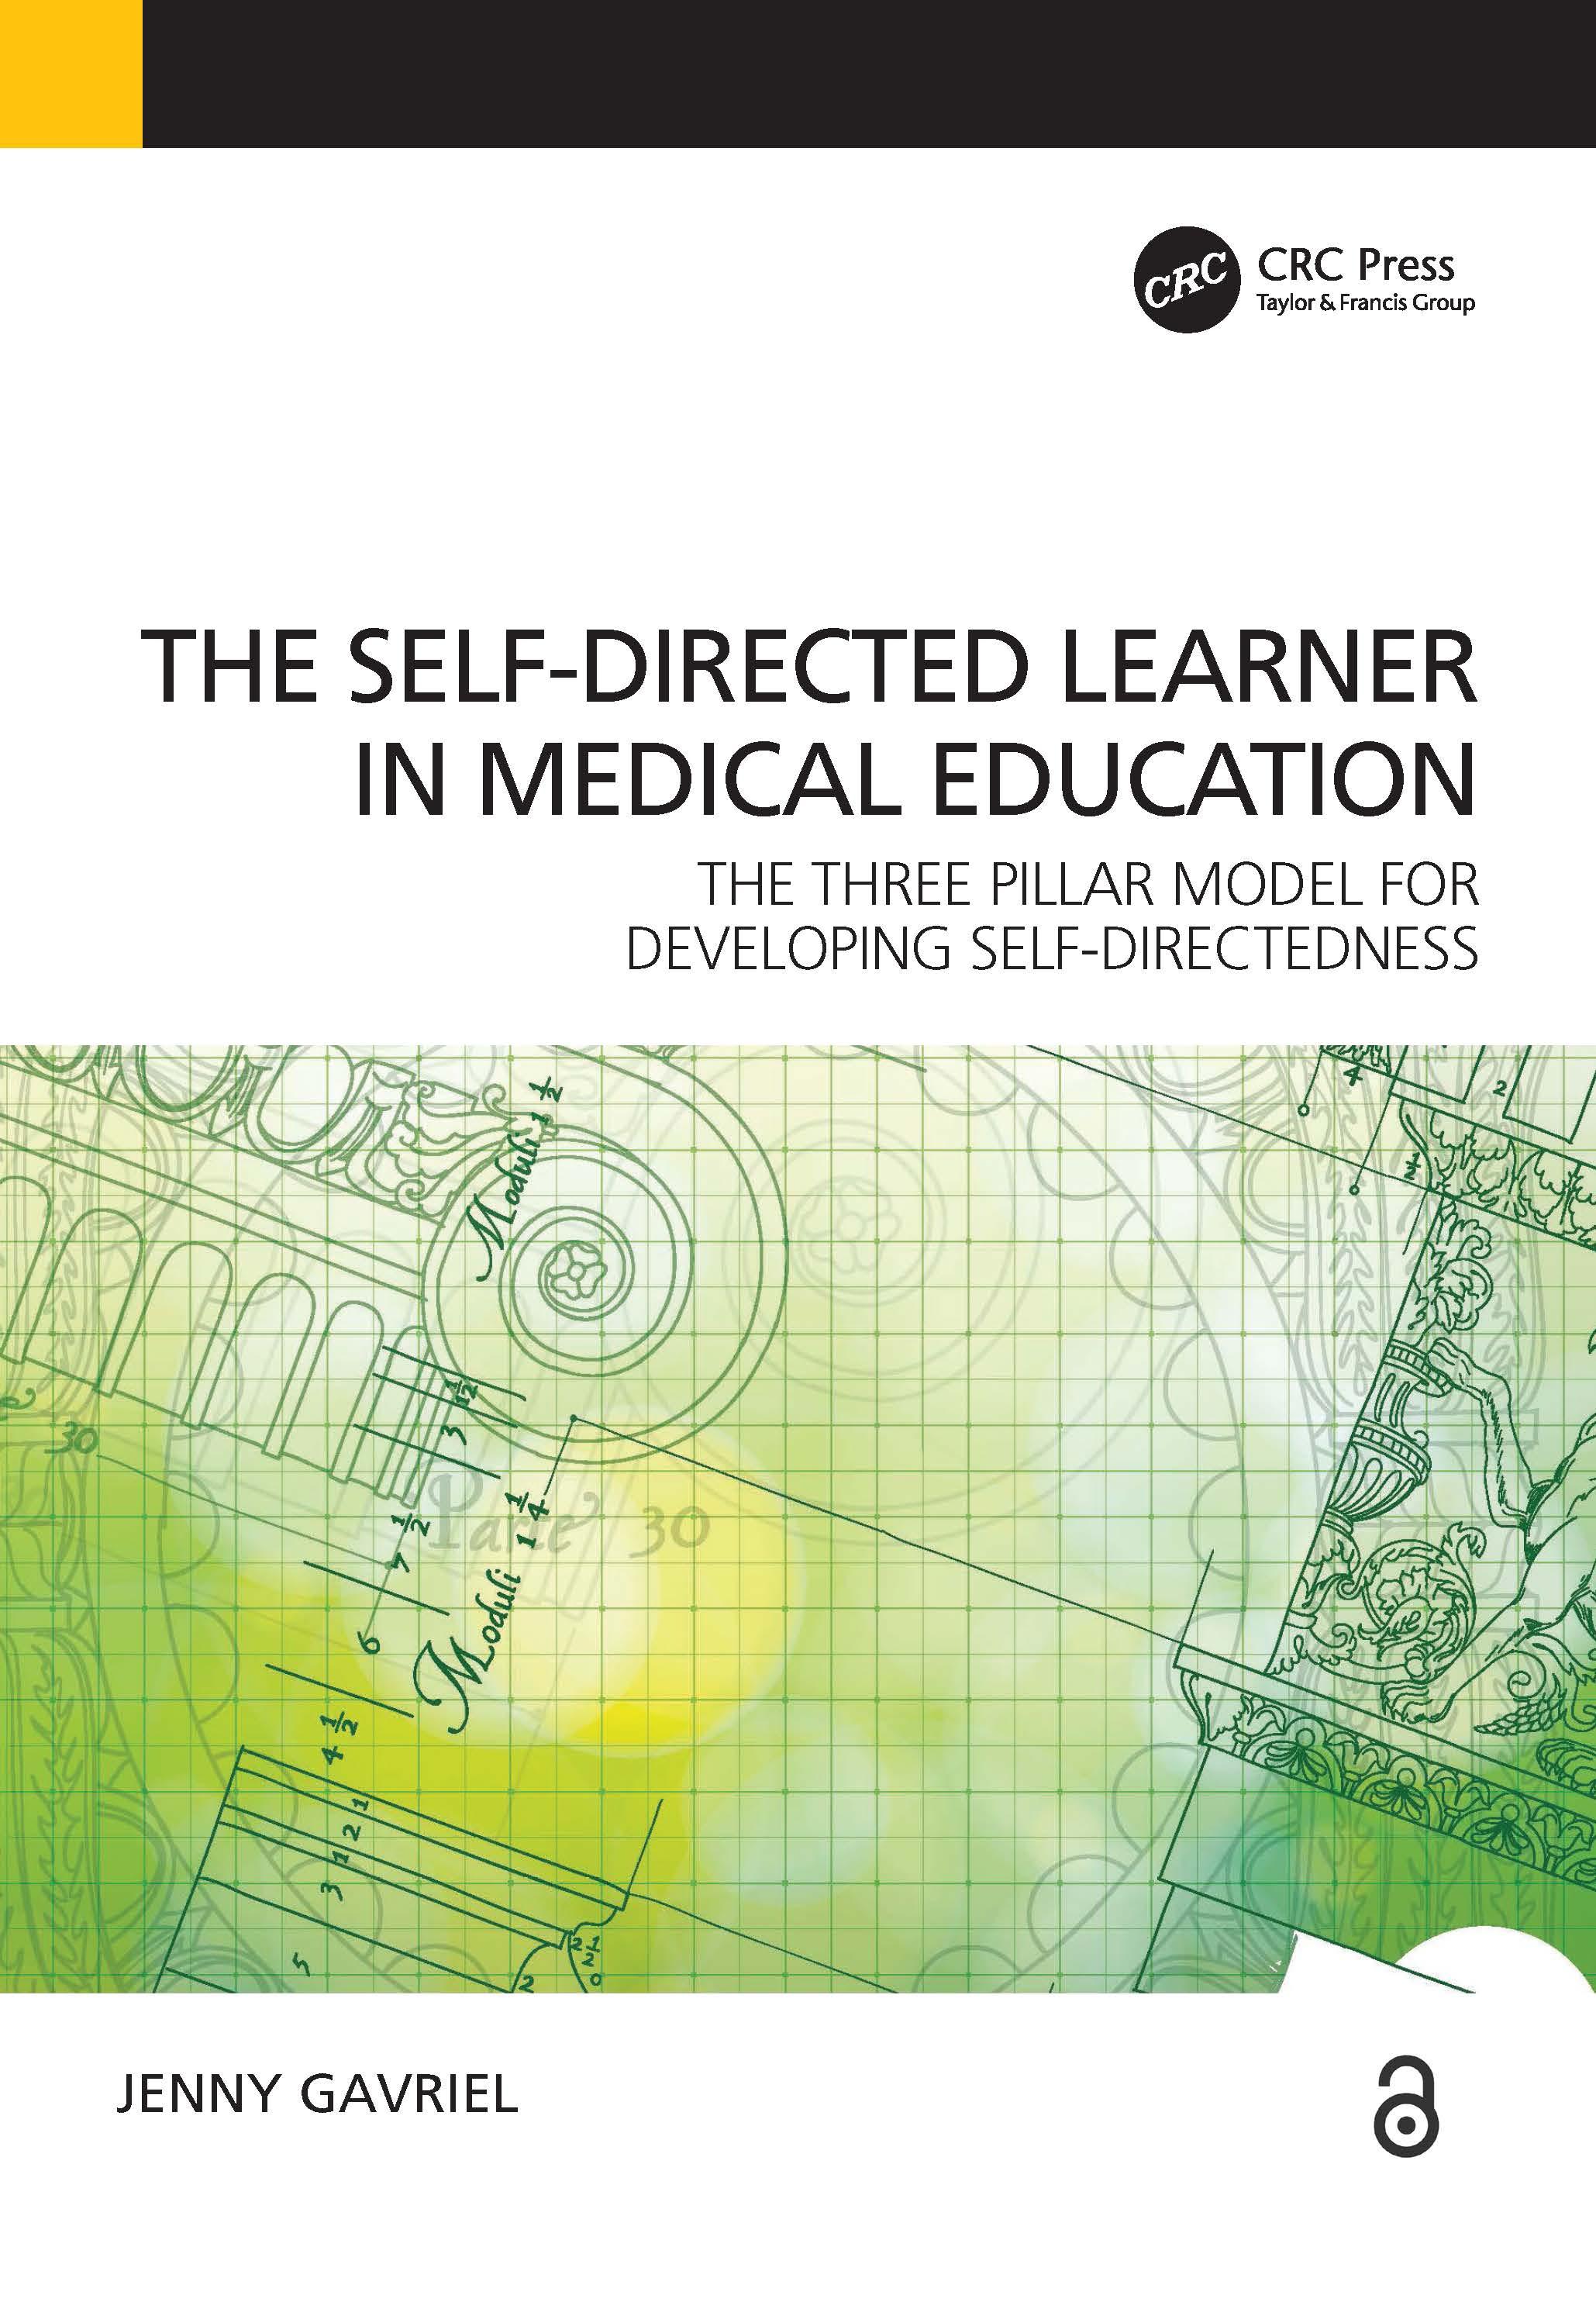 Self-Directed Learner - the Three Pillar Model of Self-Directedness